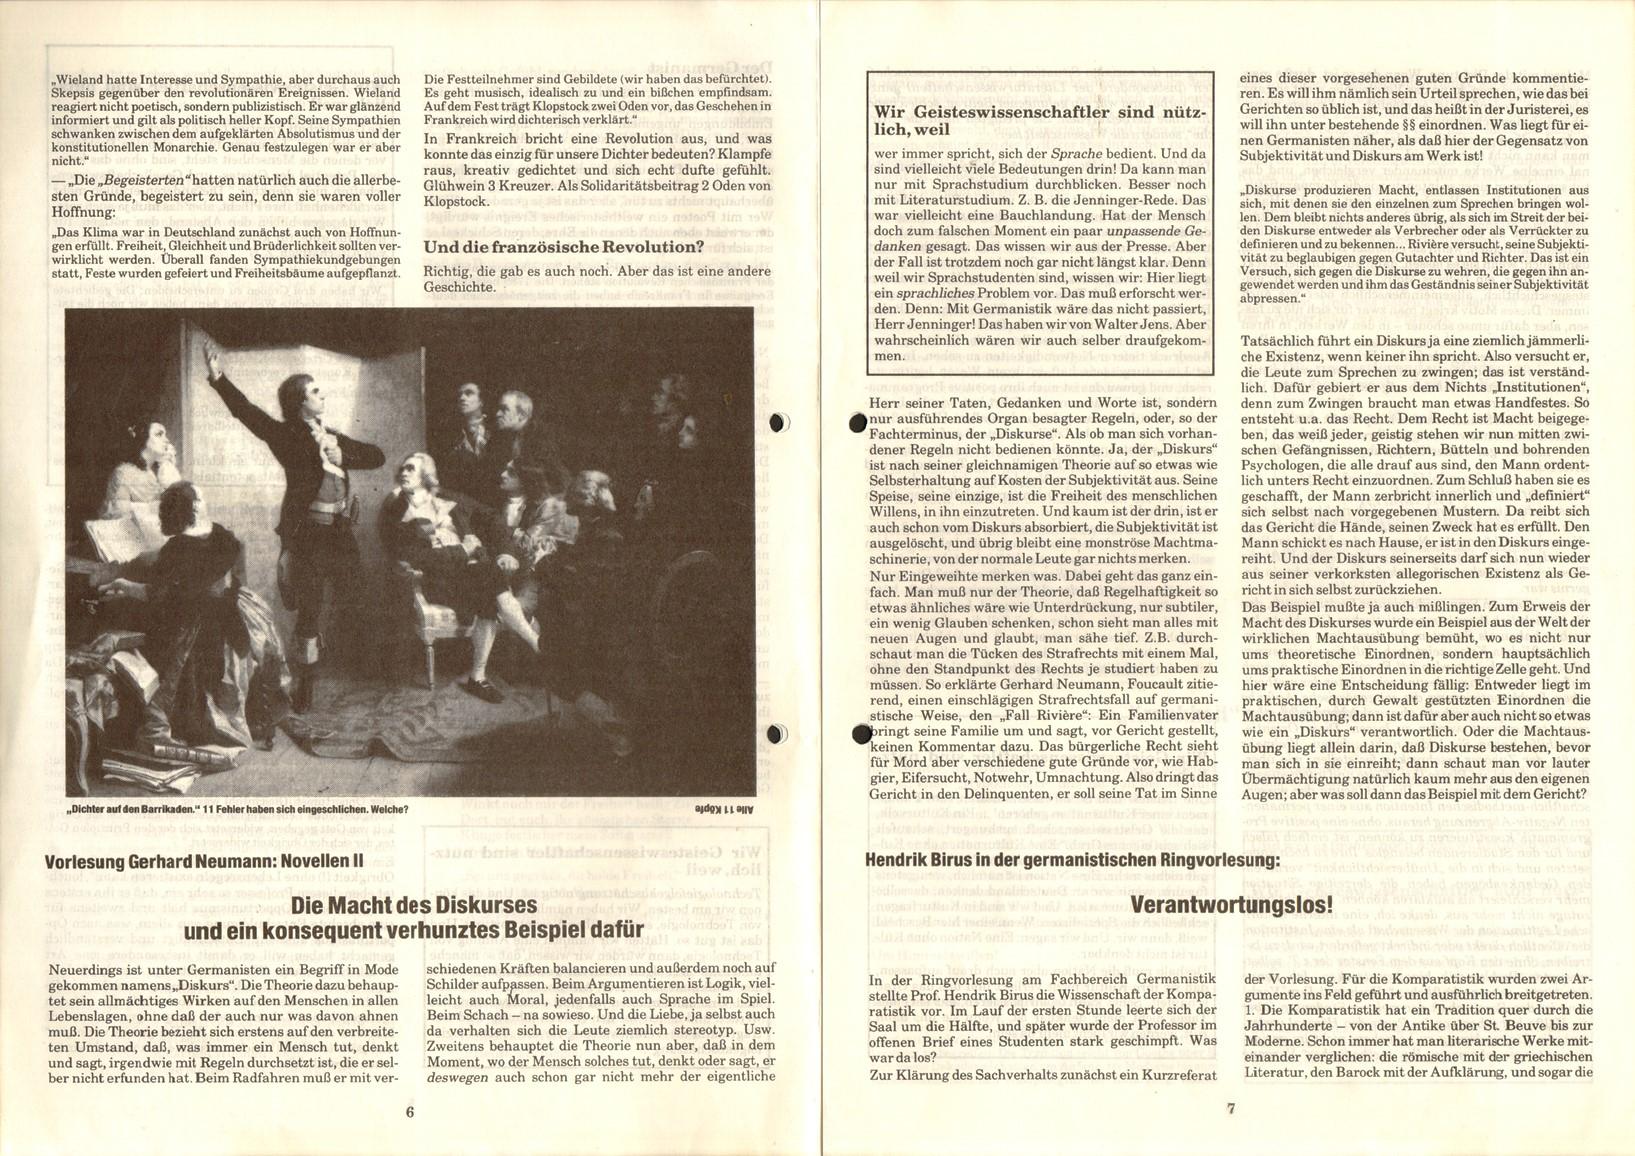 Muenchen_MG_FB_Germanistik_19881001_04